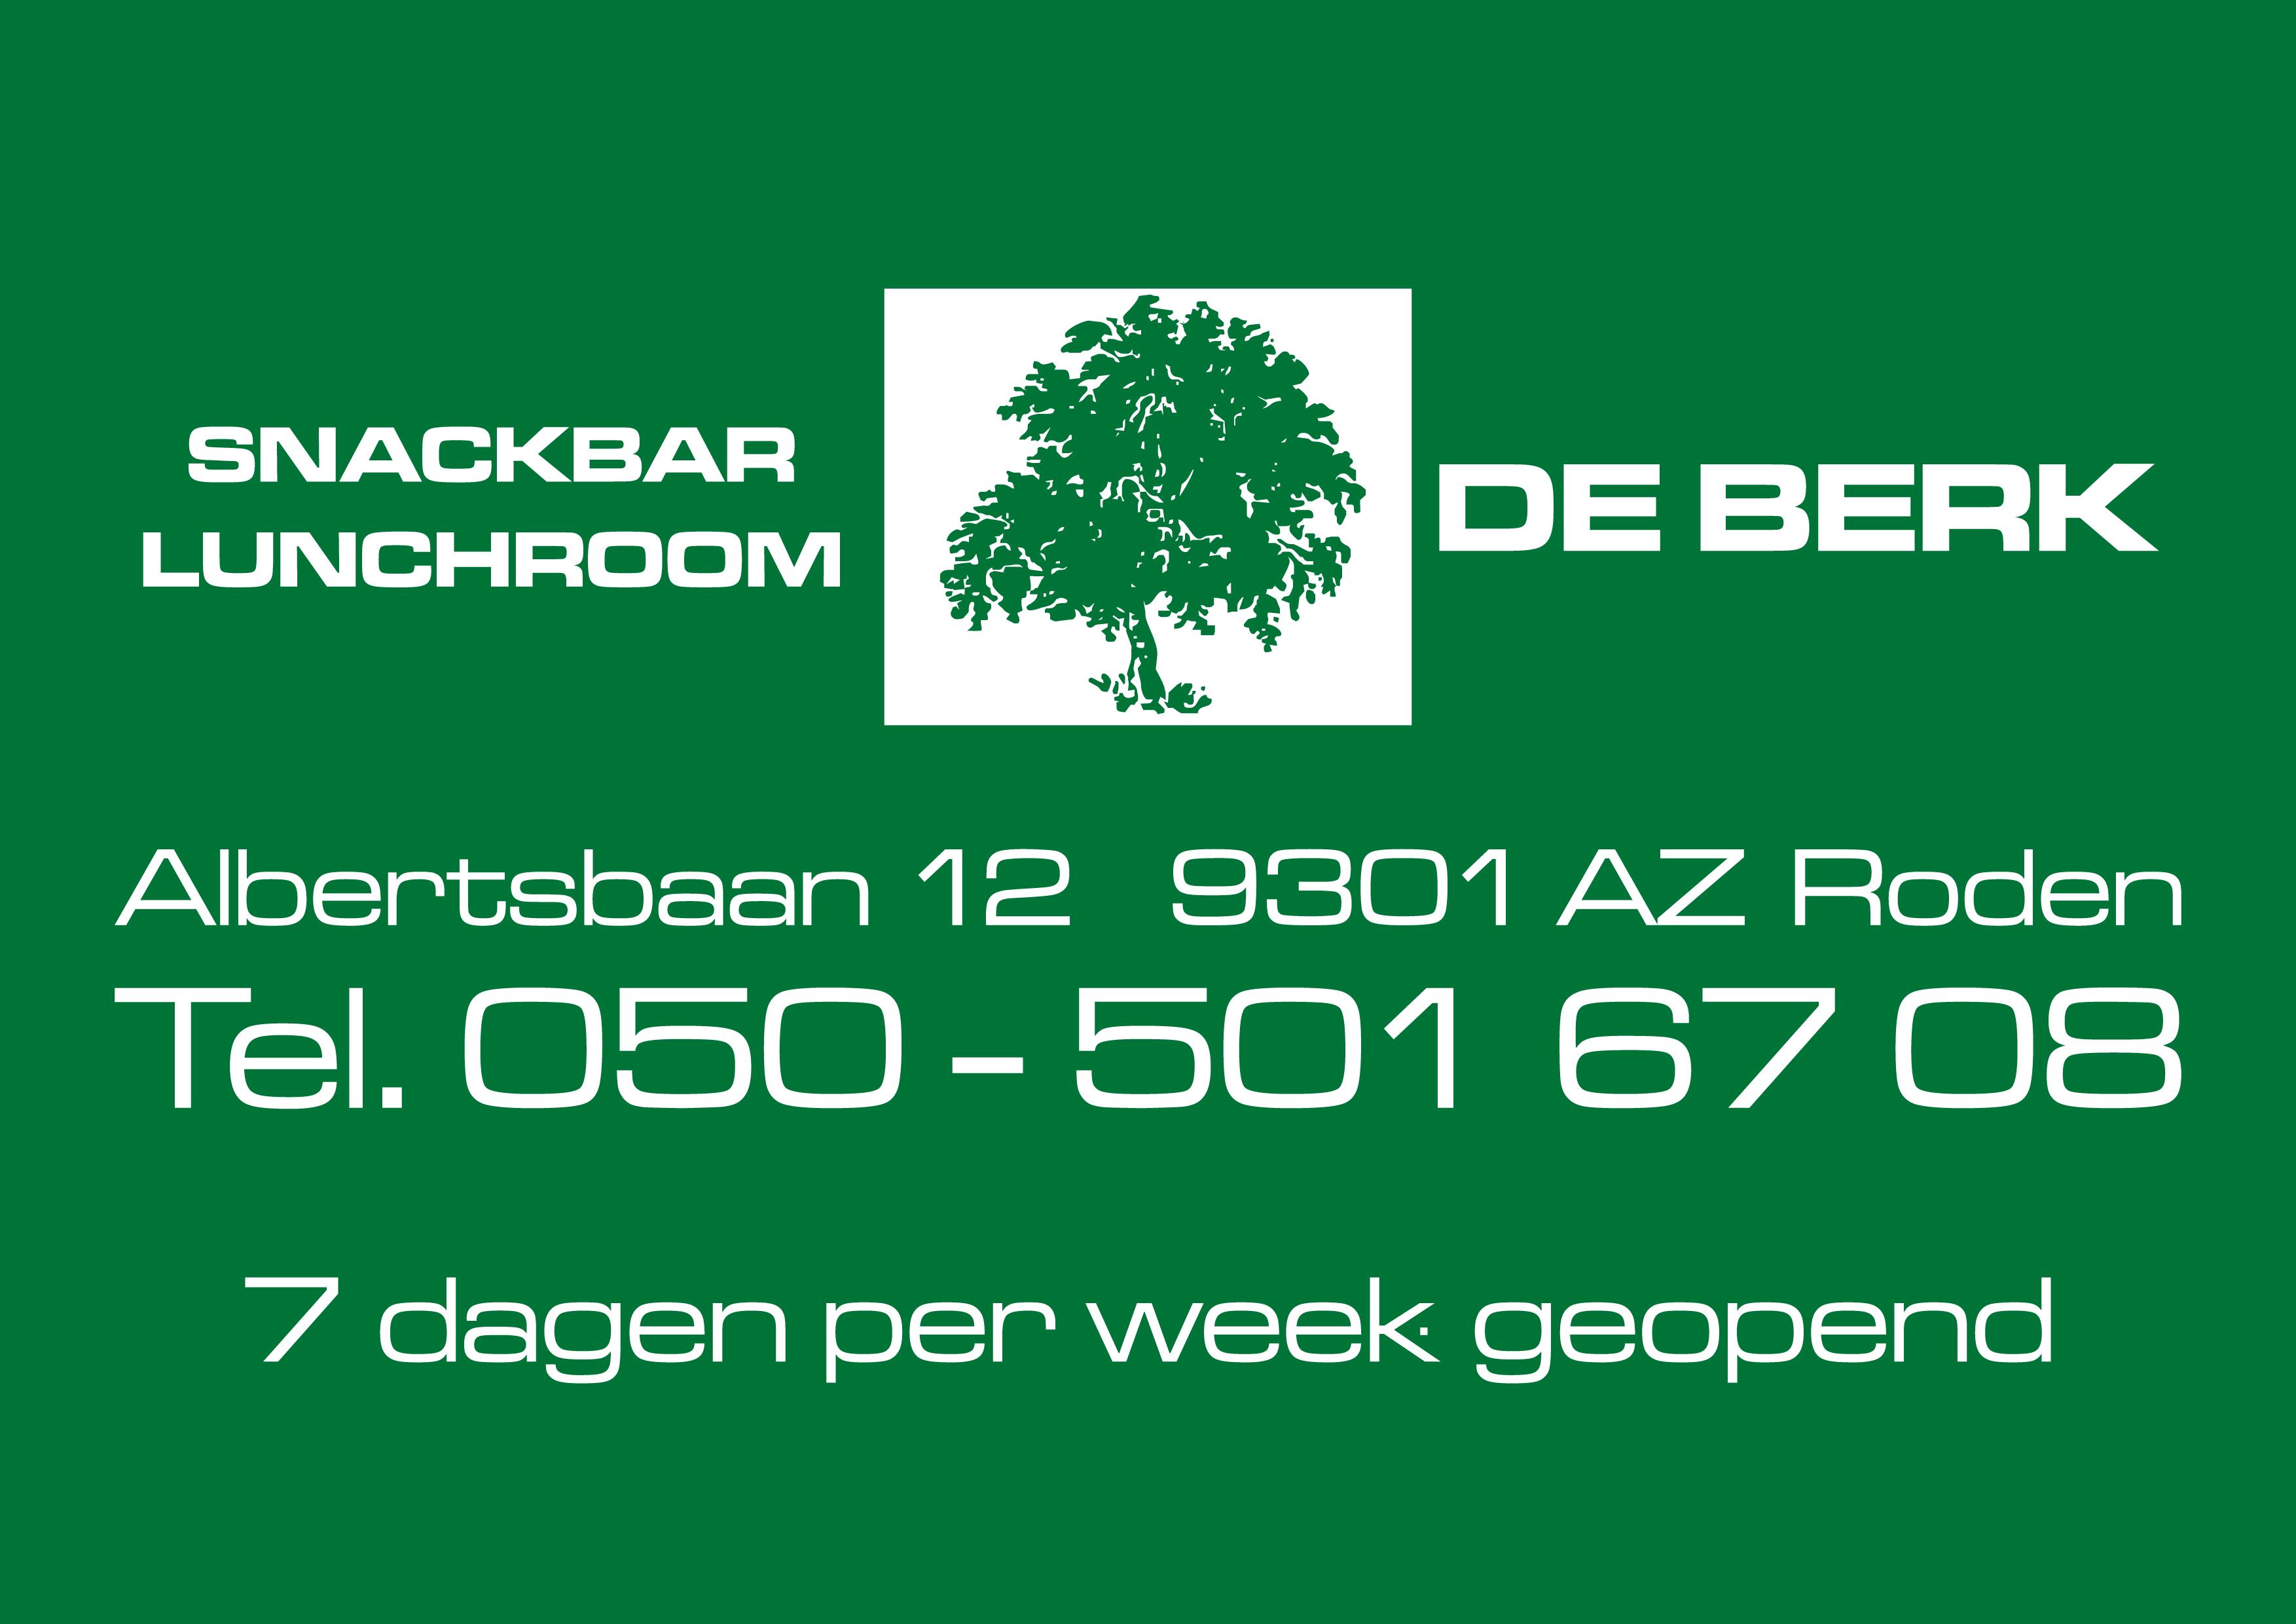 logo-deberk-2012.cdr